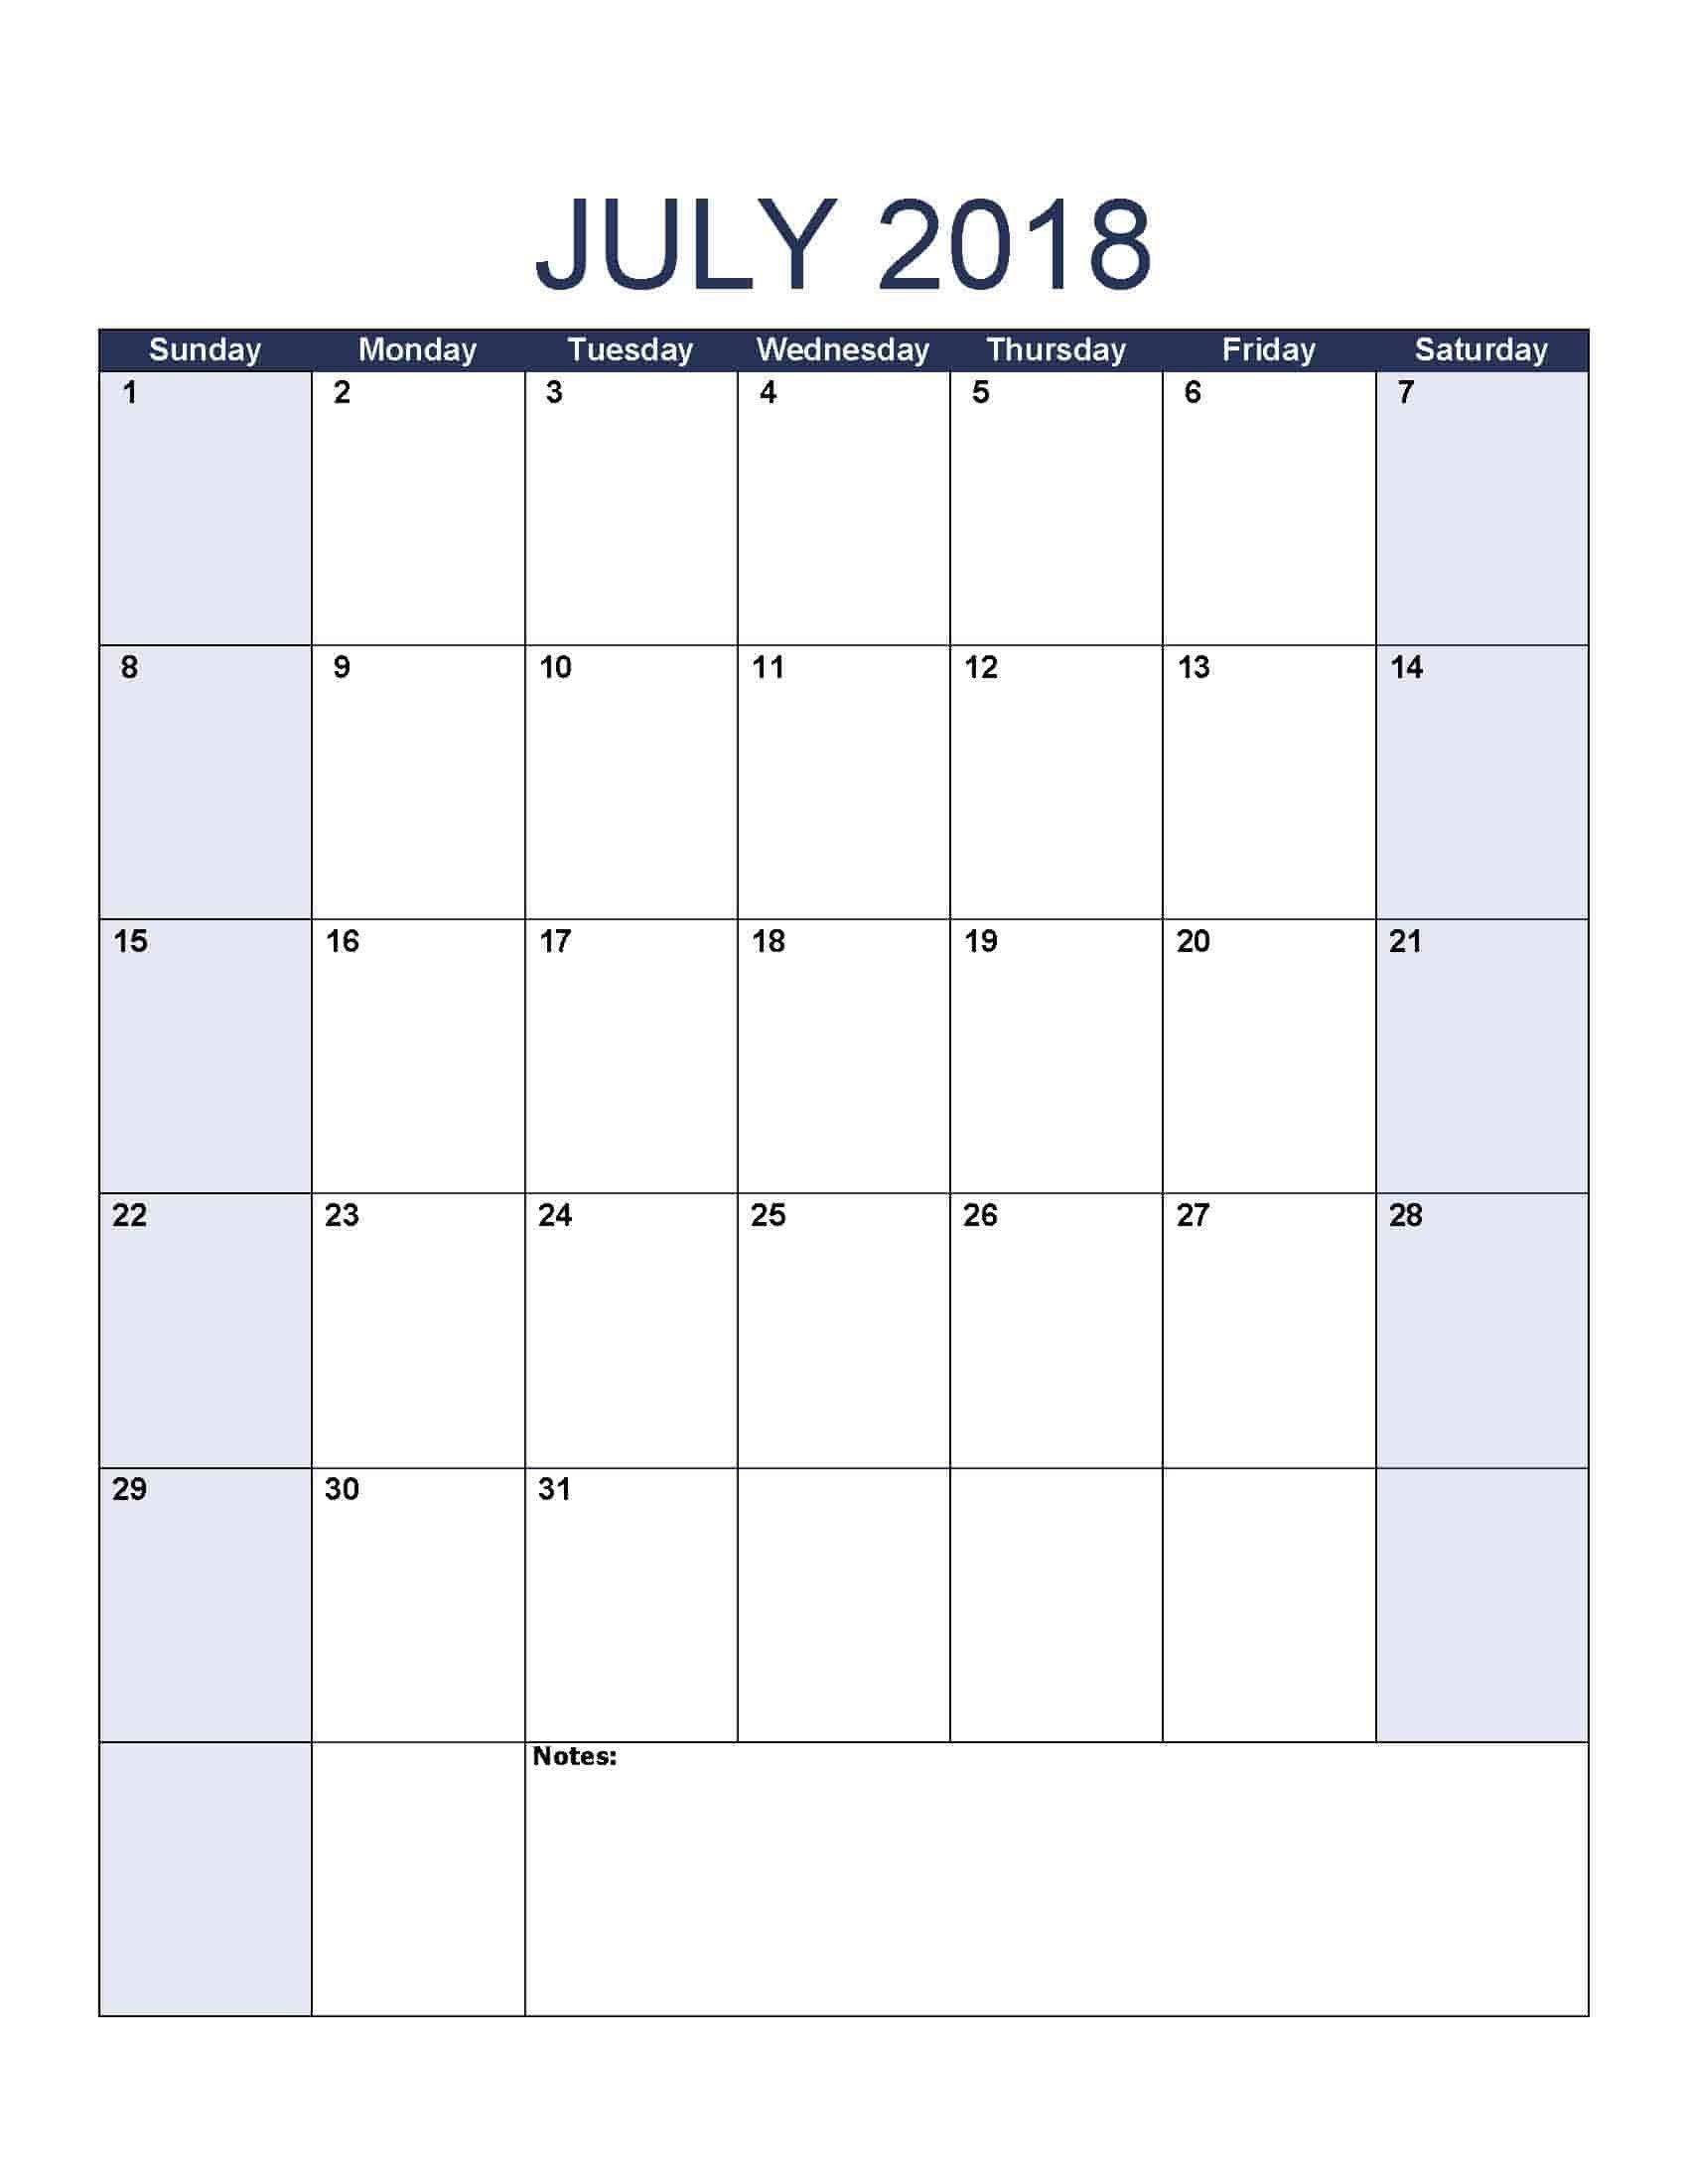 July 2018 Calendar – Free, Printable Calendar Templates Free Caolendar To Fill In Online